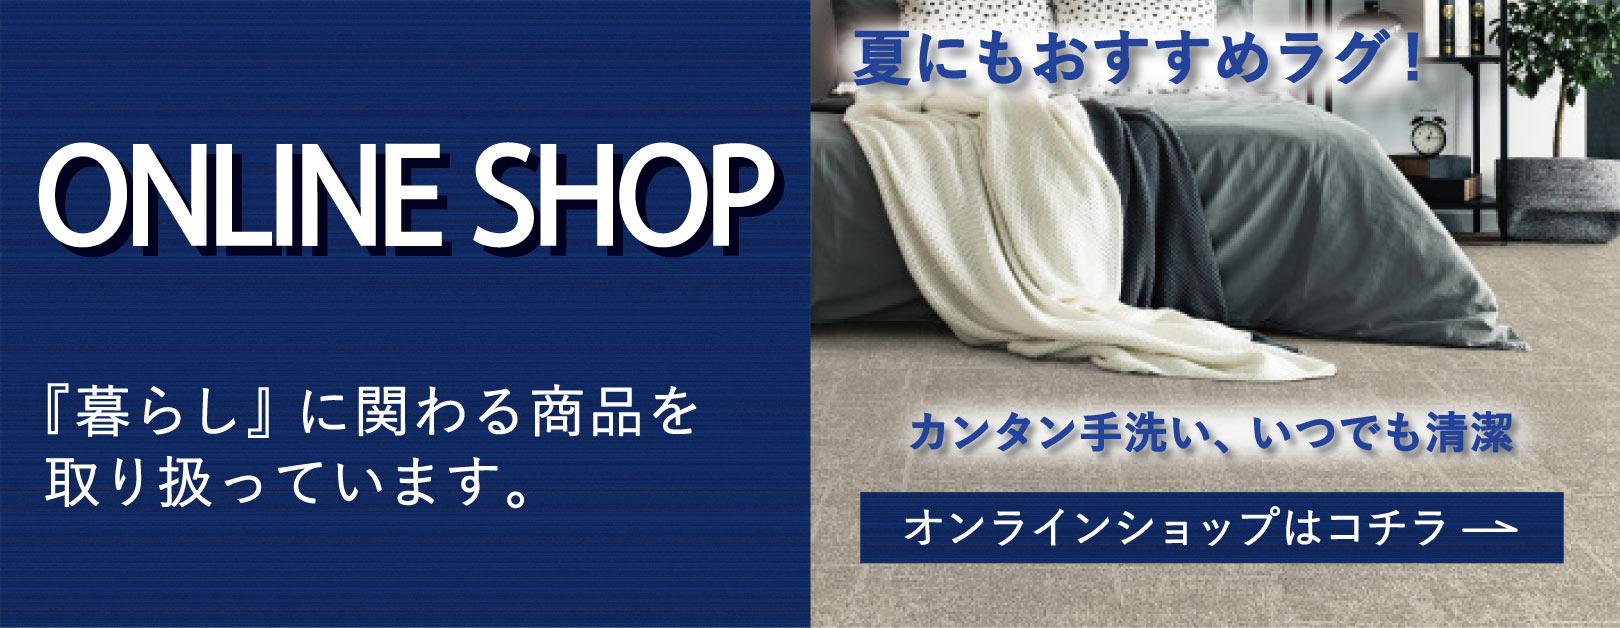 ASTAS online shop